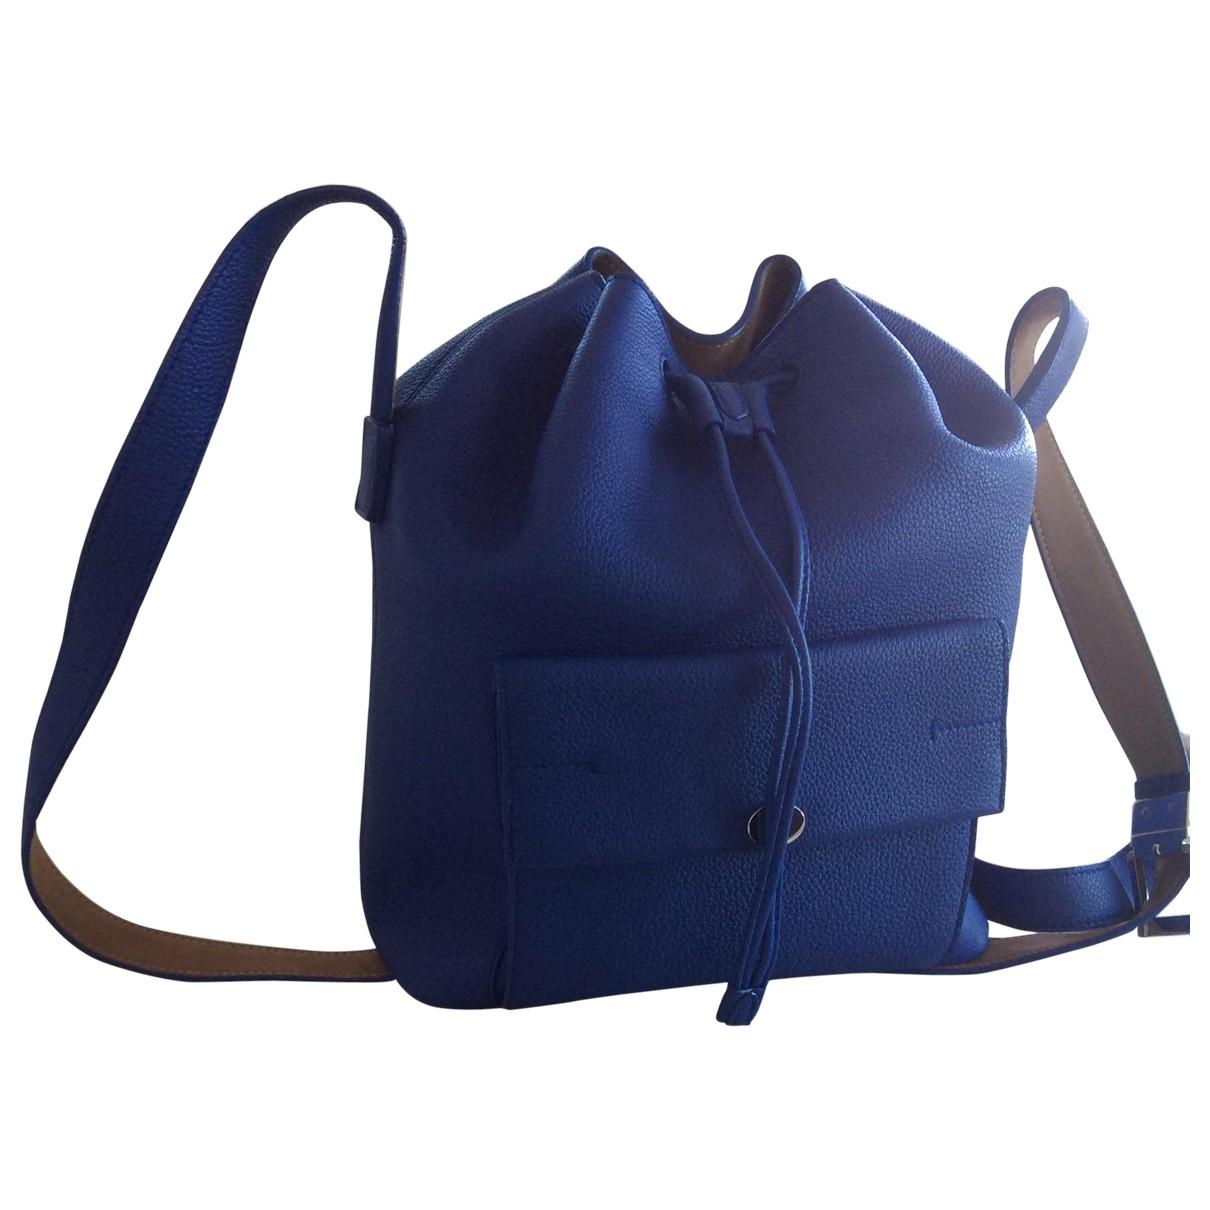 Loro Piana \N Blue Leather handbag for Women \N